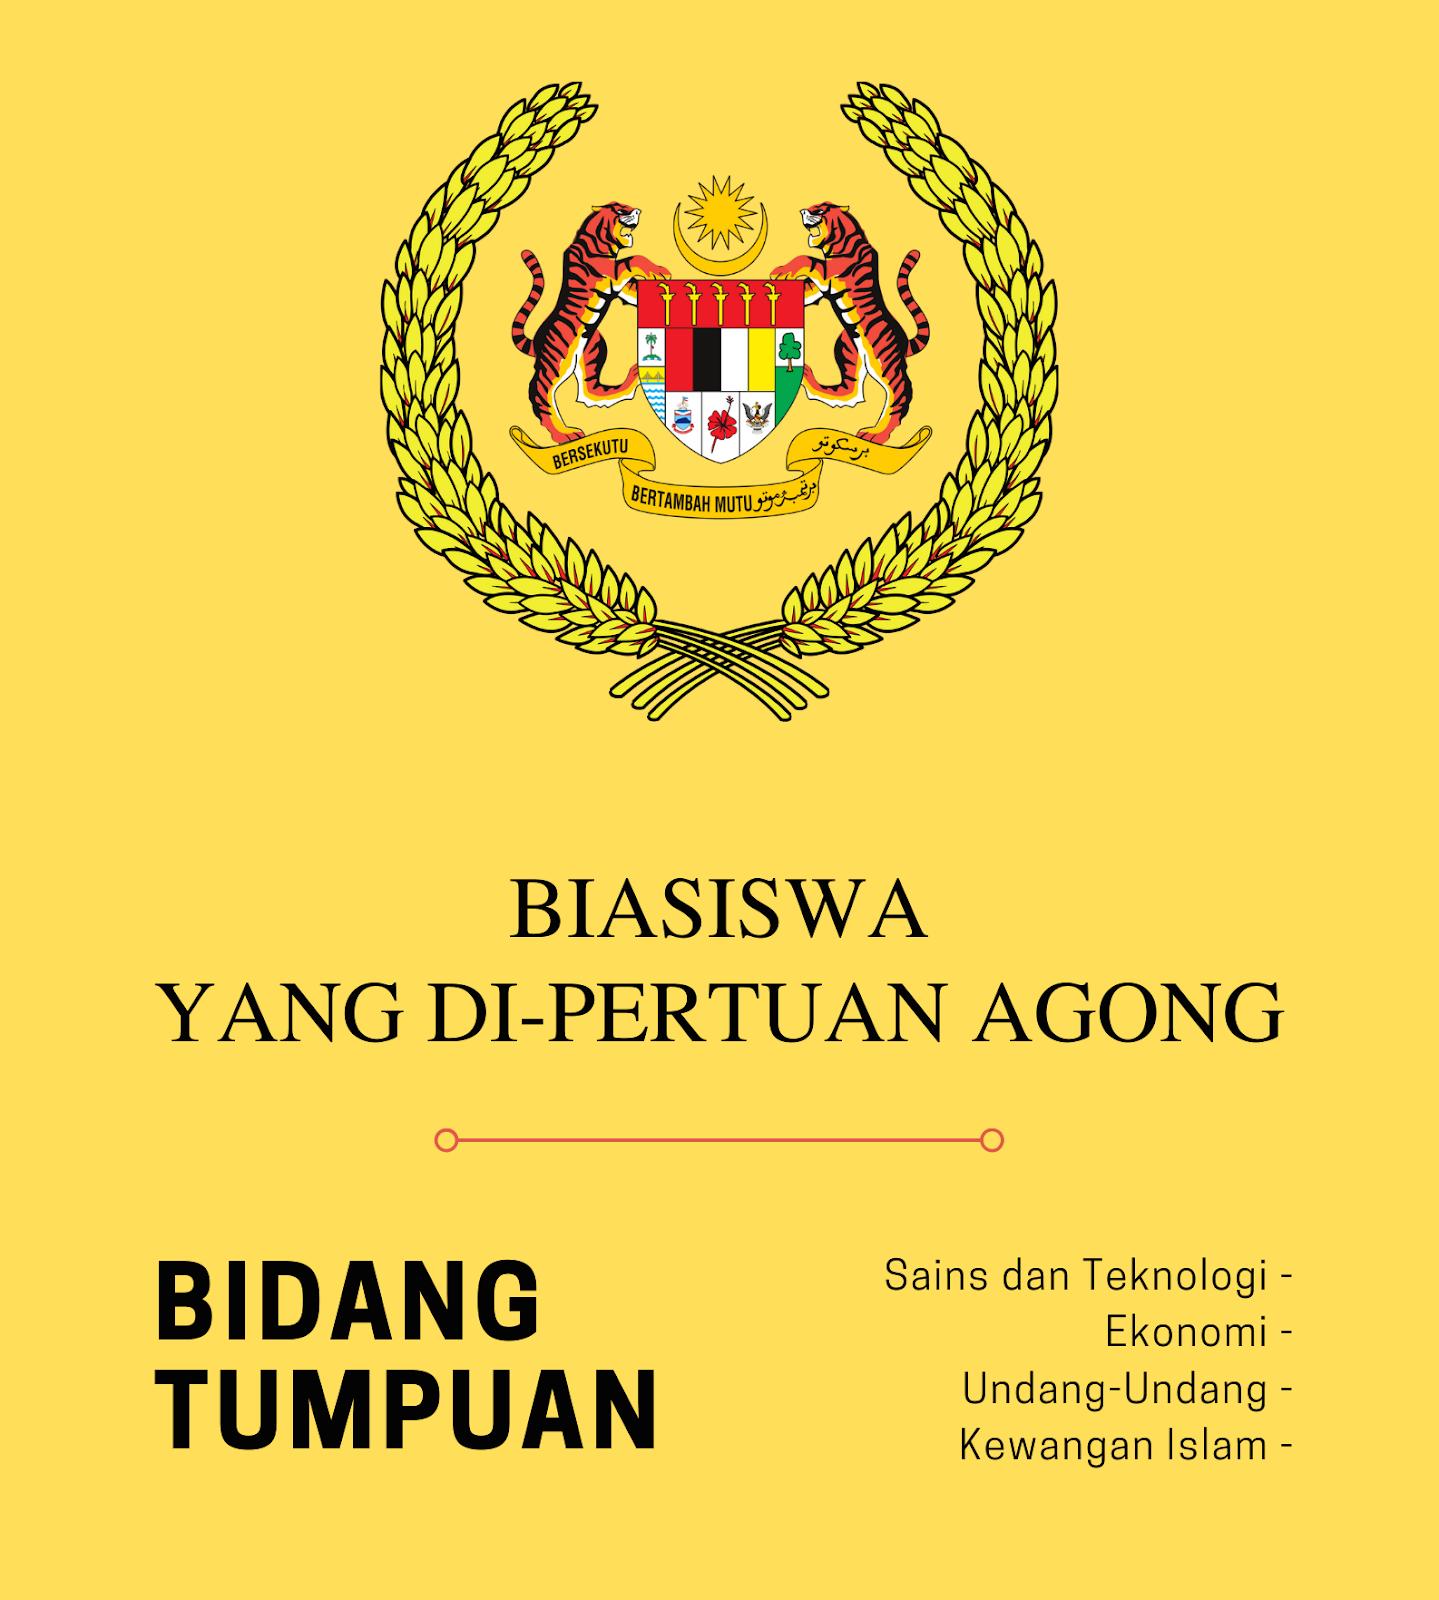 Permohonan Biasiswa Yang Di Pertuan Agong Dibuka Pada 10 Februari 2020